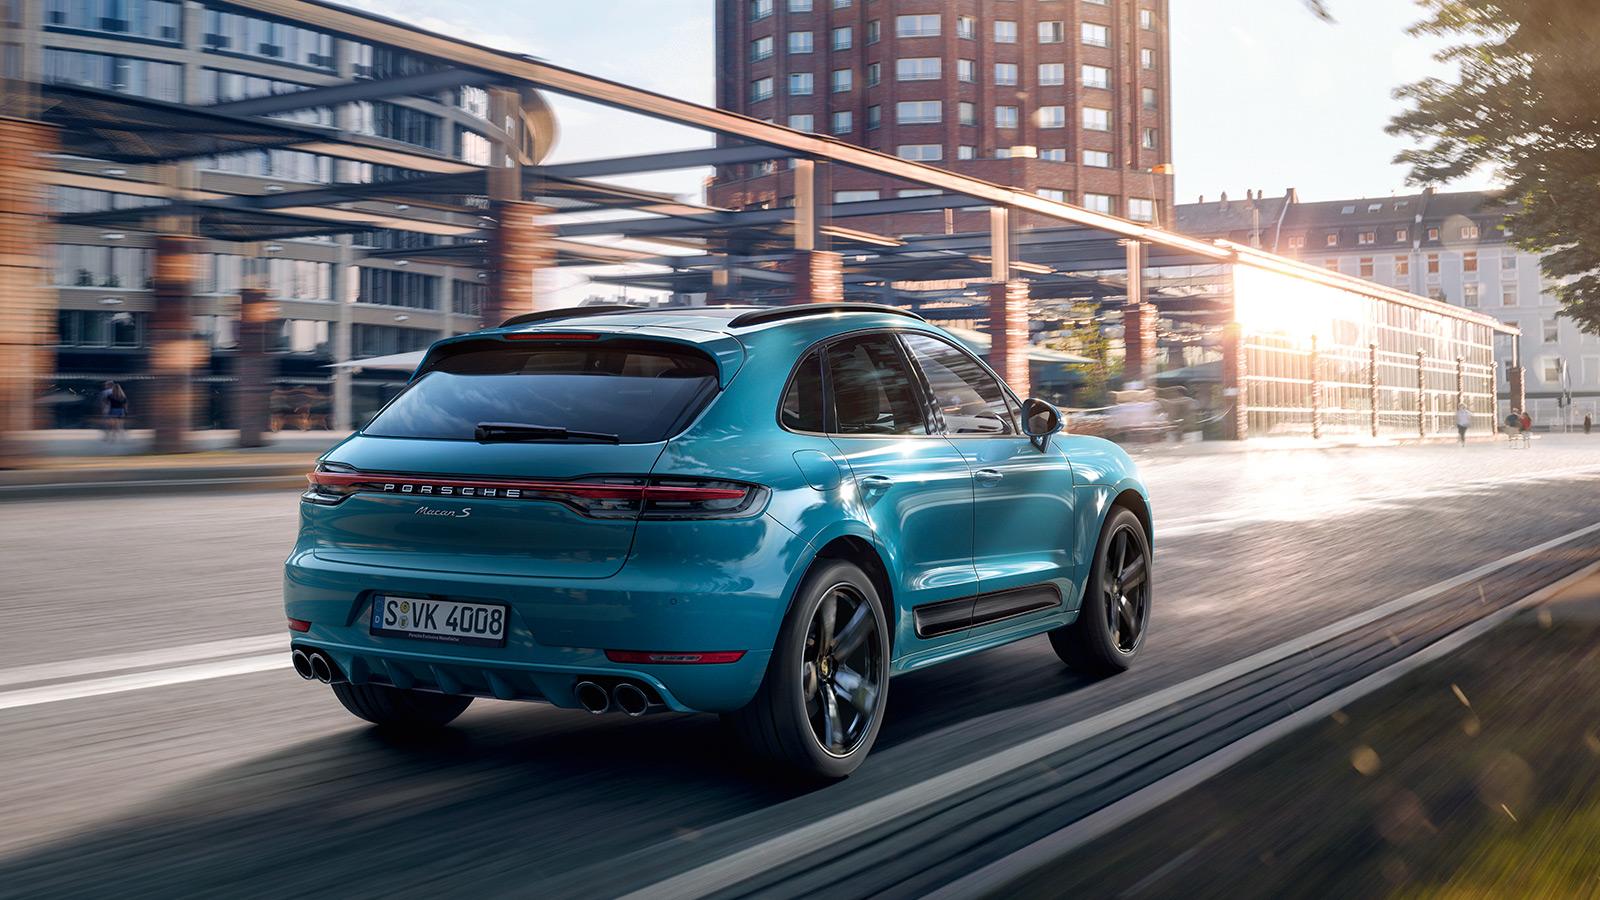 Porsche - Exterior and performance